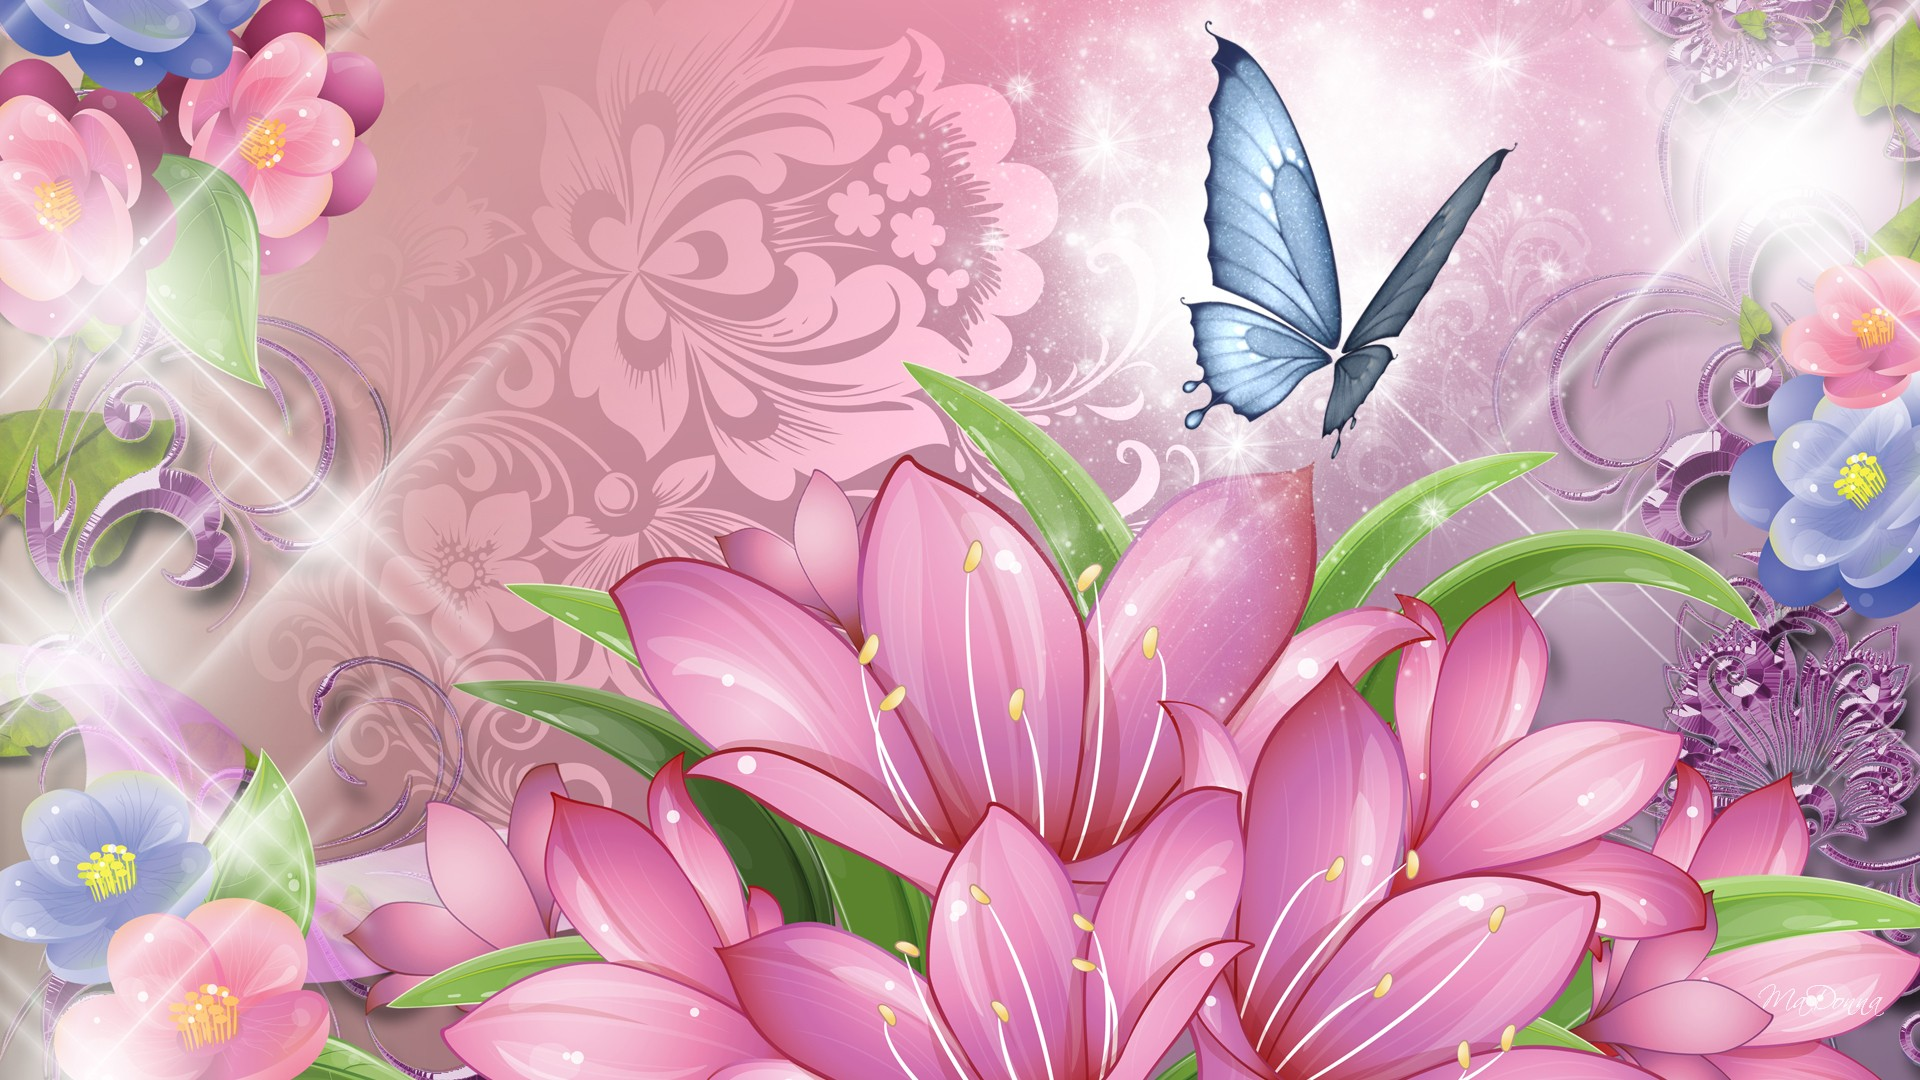 Cute Girly Wallpaper For Bedroom Butterfly Backgrounds For Walls Pixelstalk Net